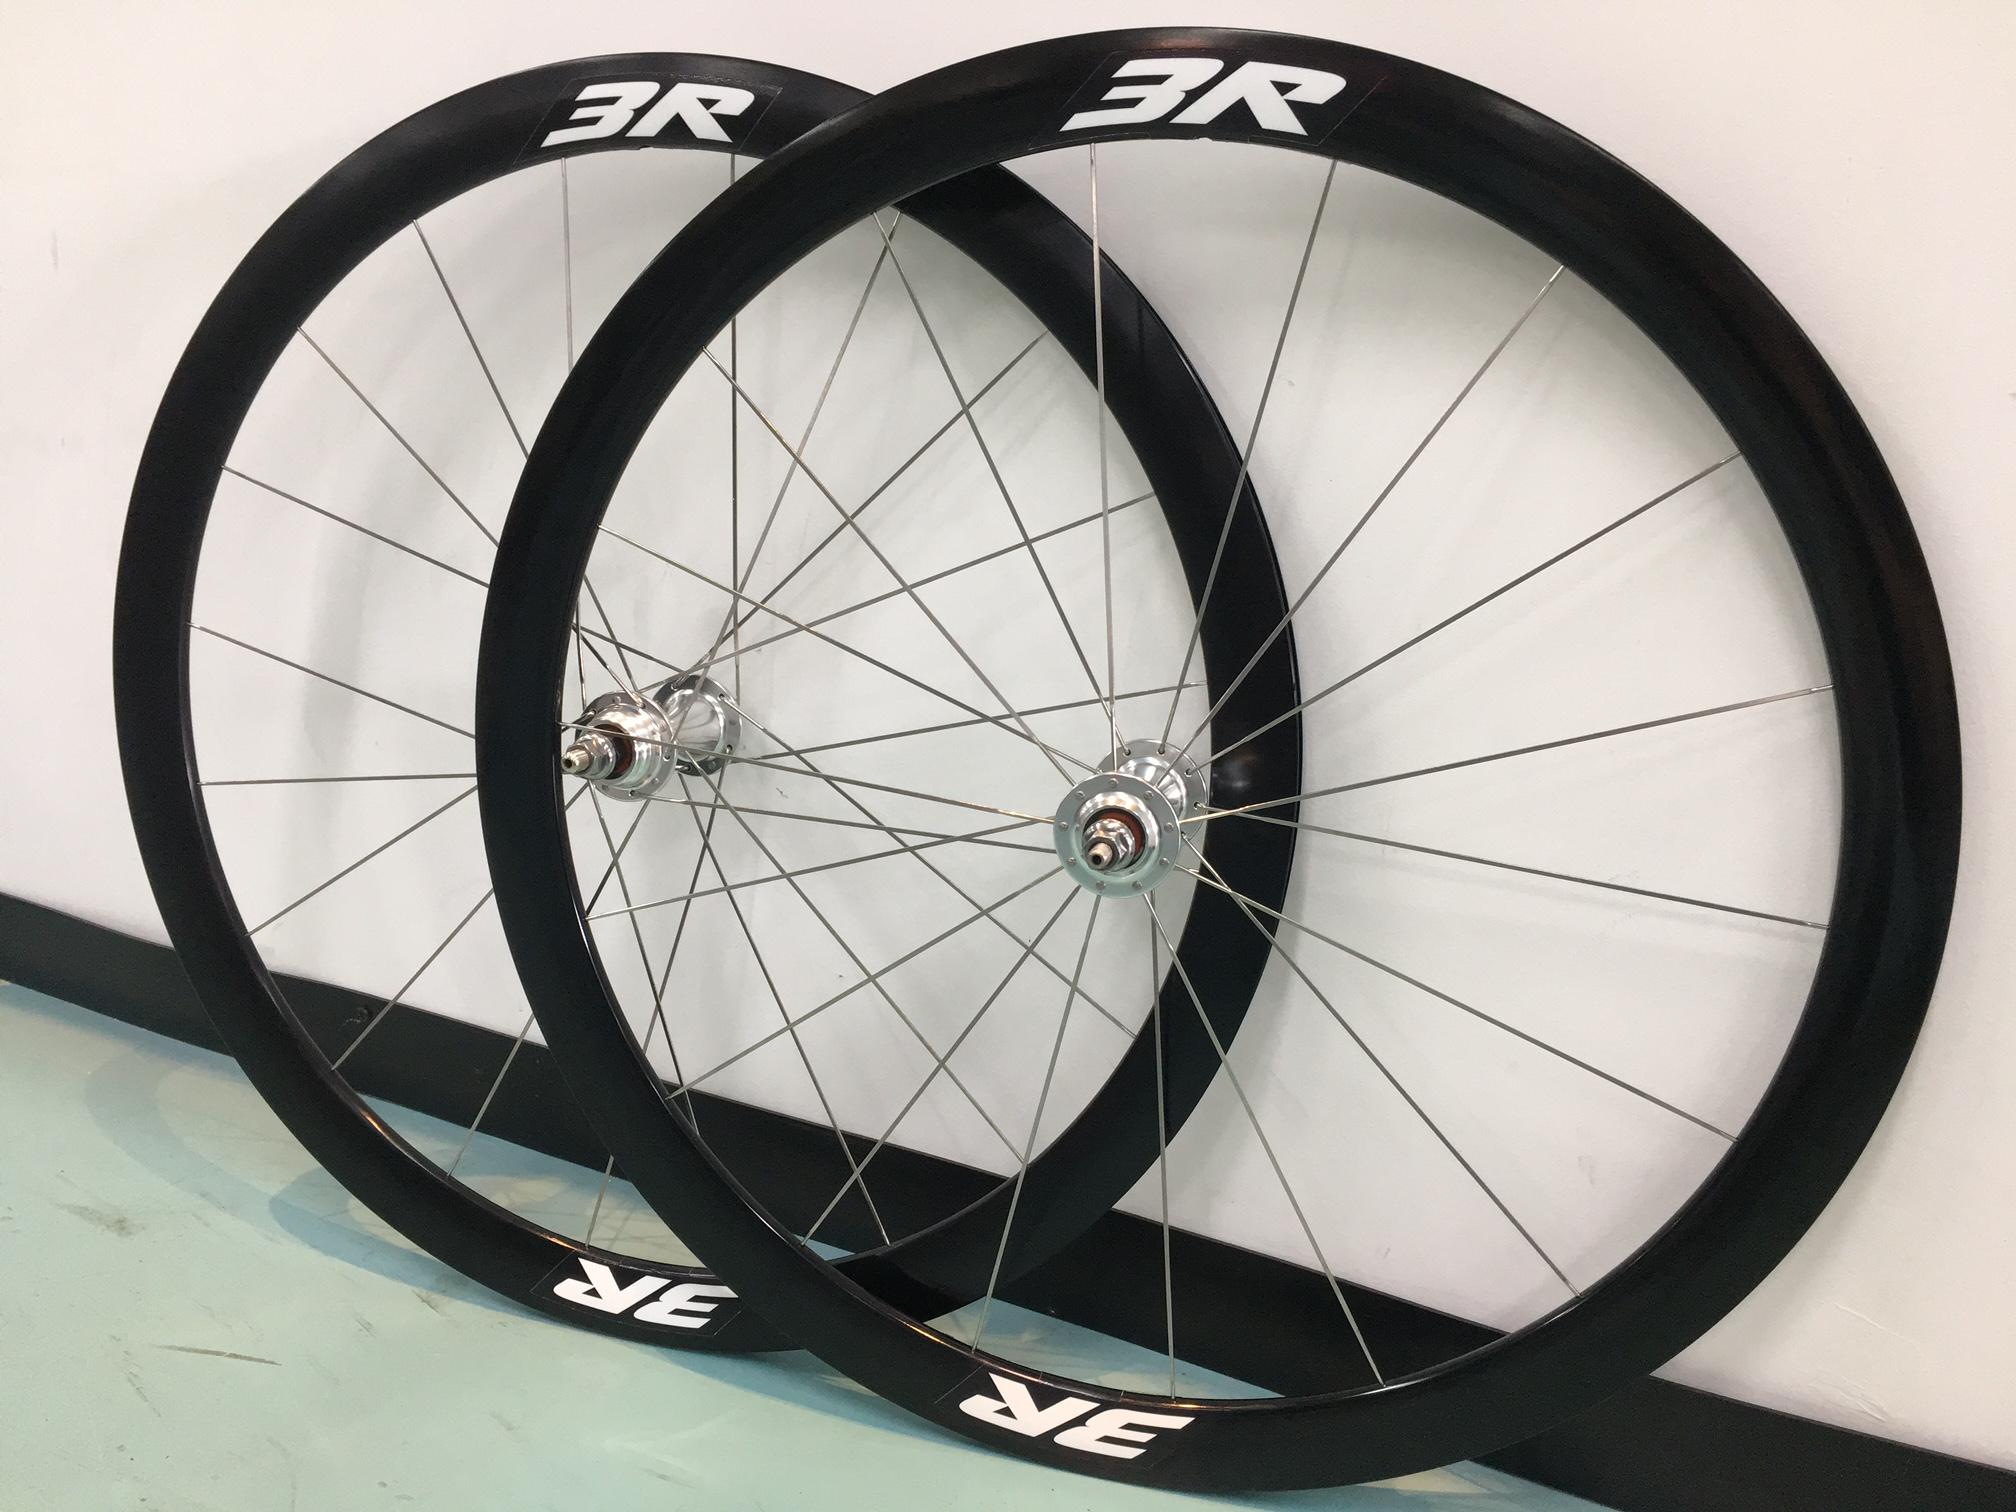 3r track wheels